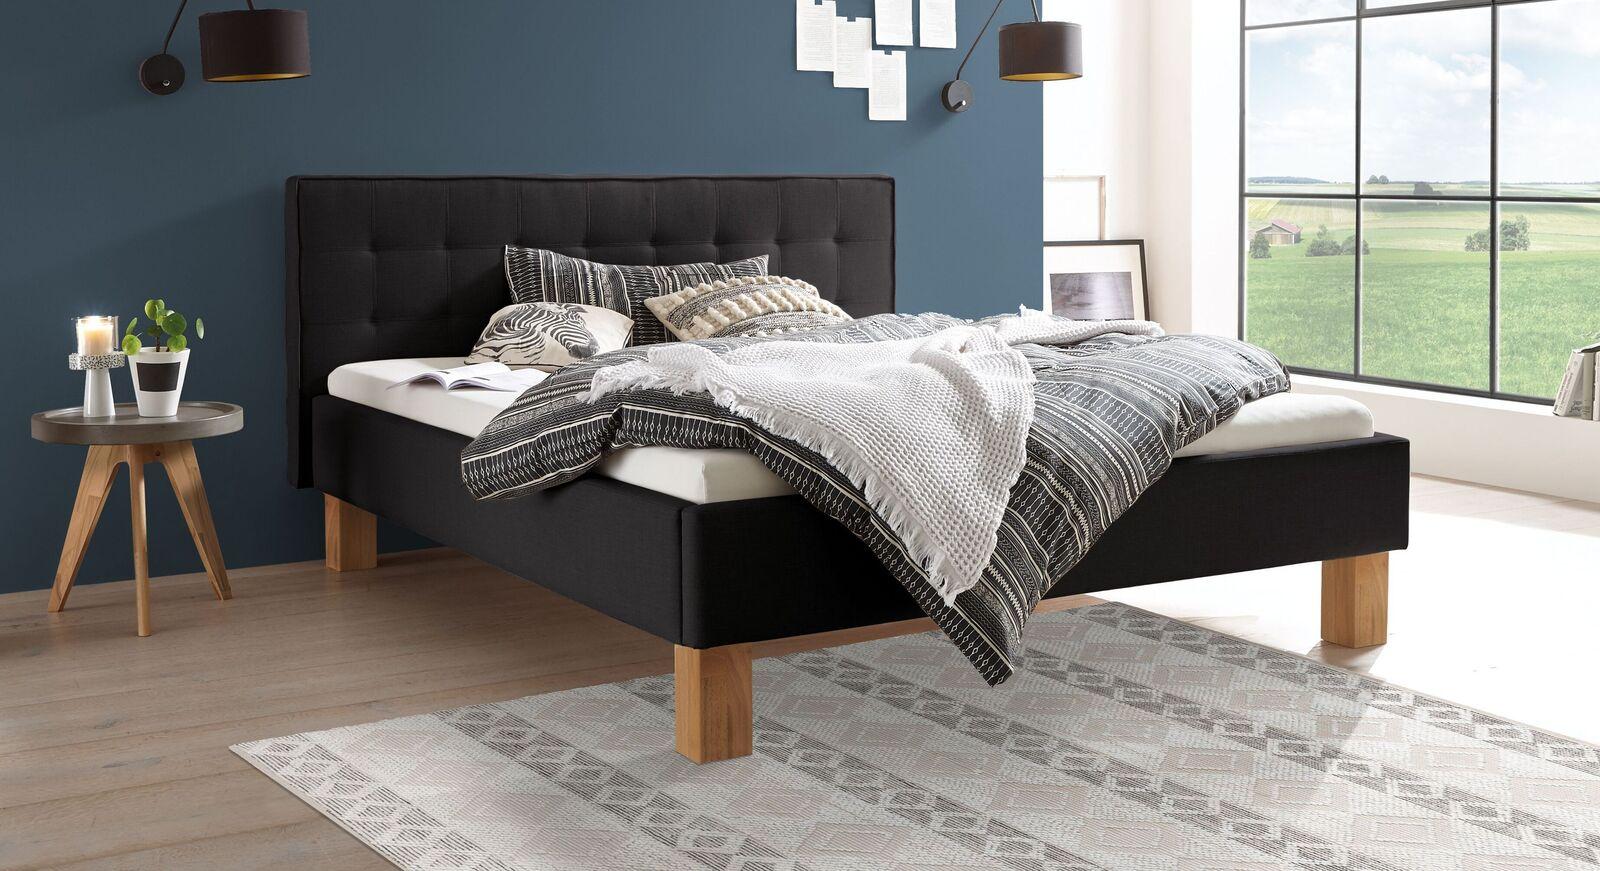 Bett Nieta aus anthrazitfarbenem Webstoff